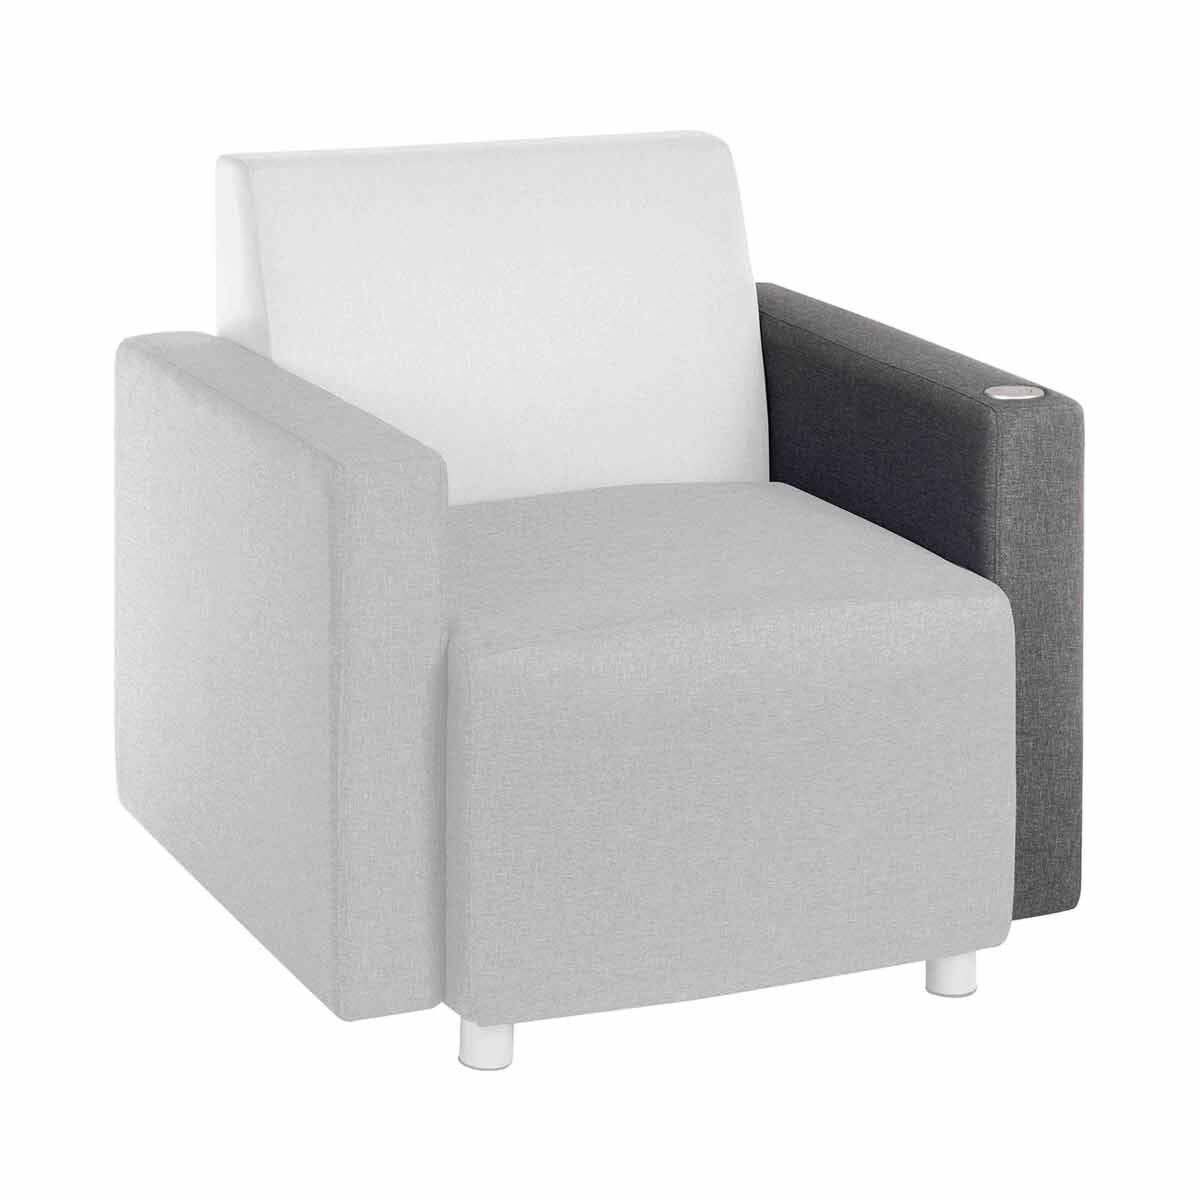 Teknik Office Cube Modular Reception Chair USB Arm Left